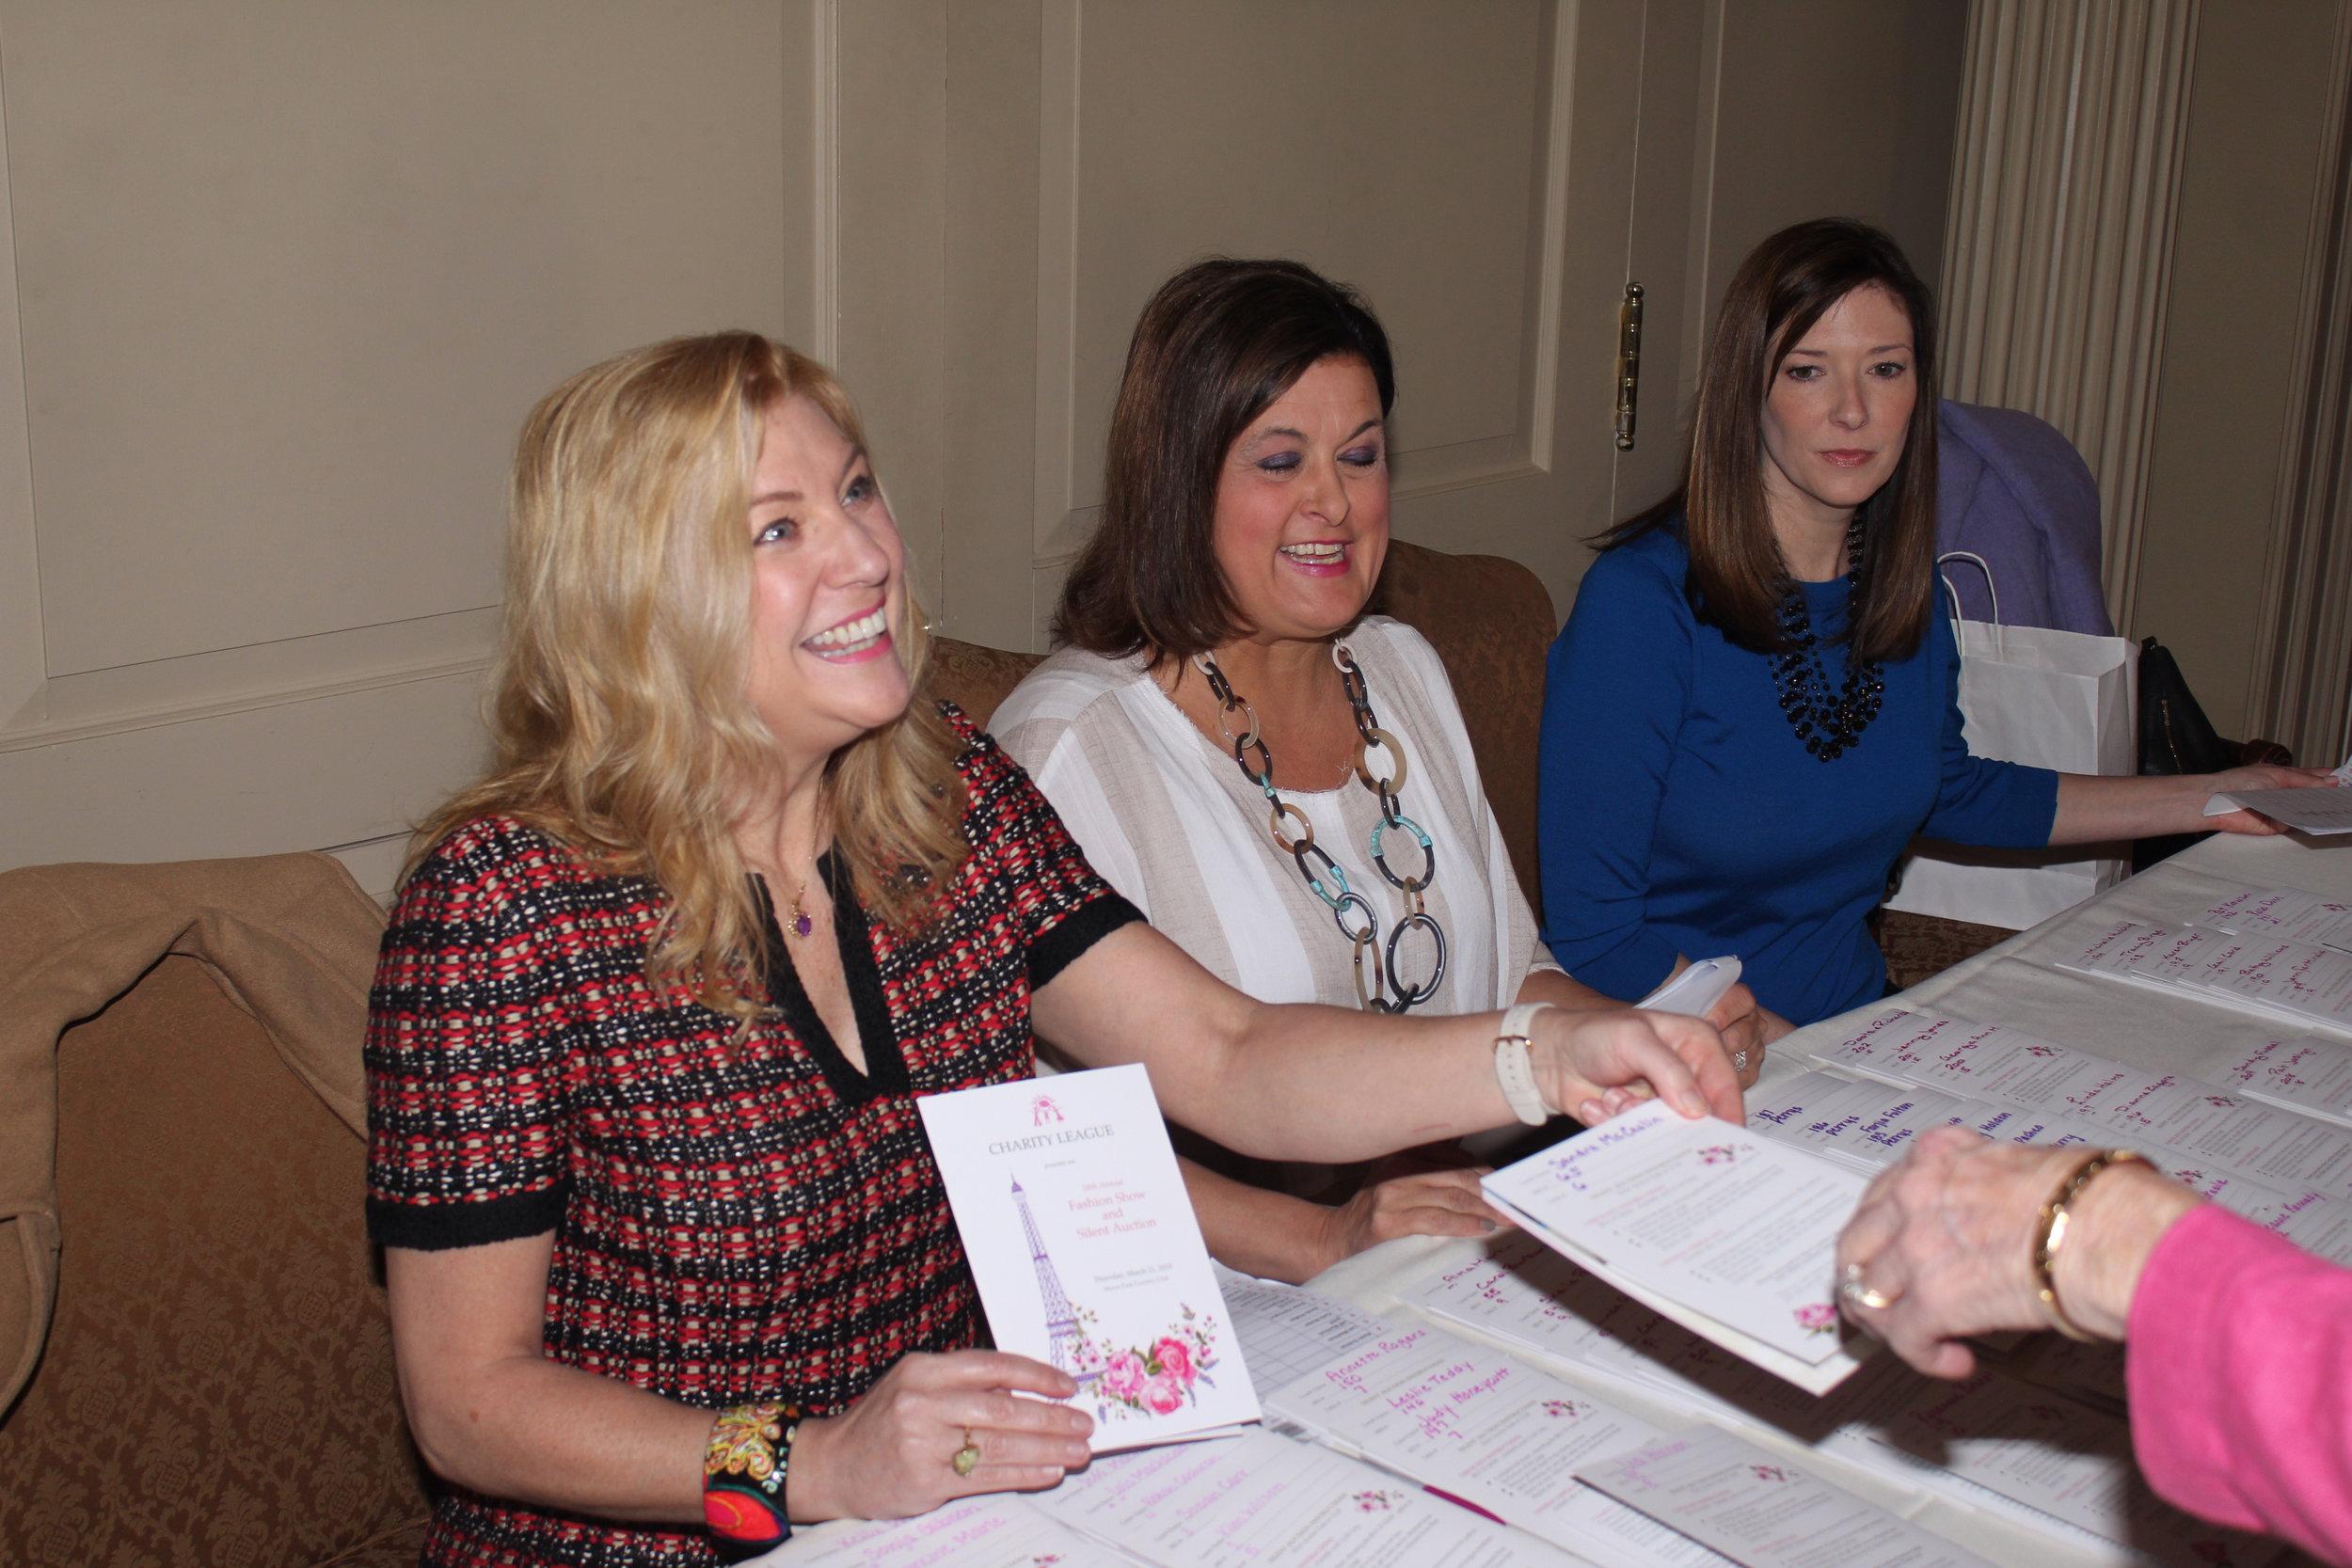 Paige Robertson, Caroline Horne and Jennifer Vick